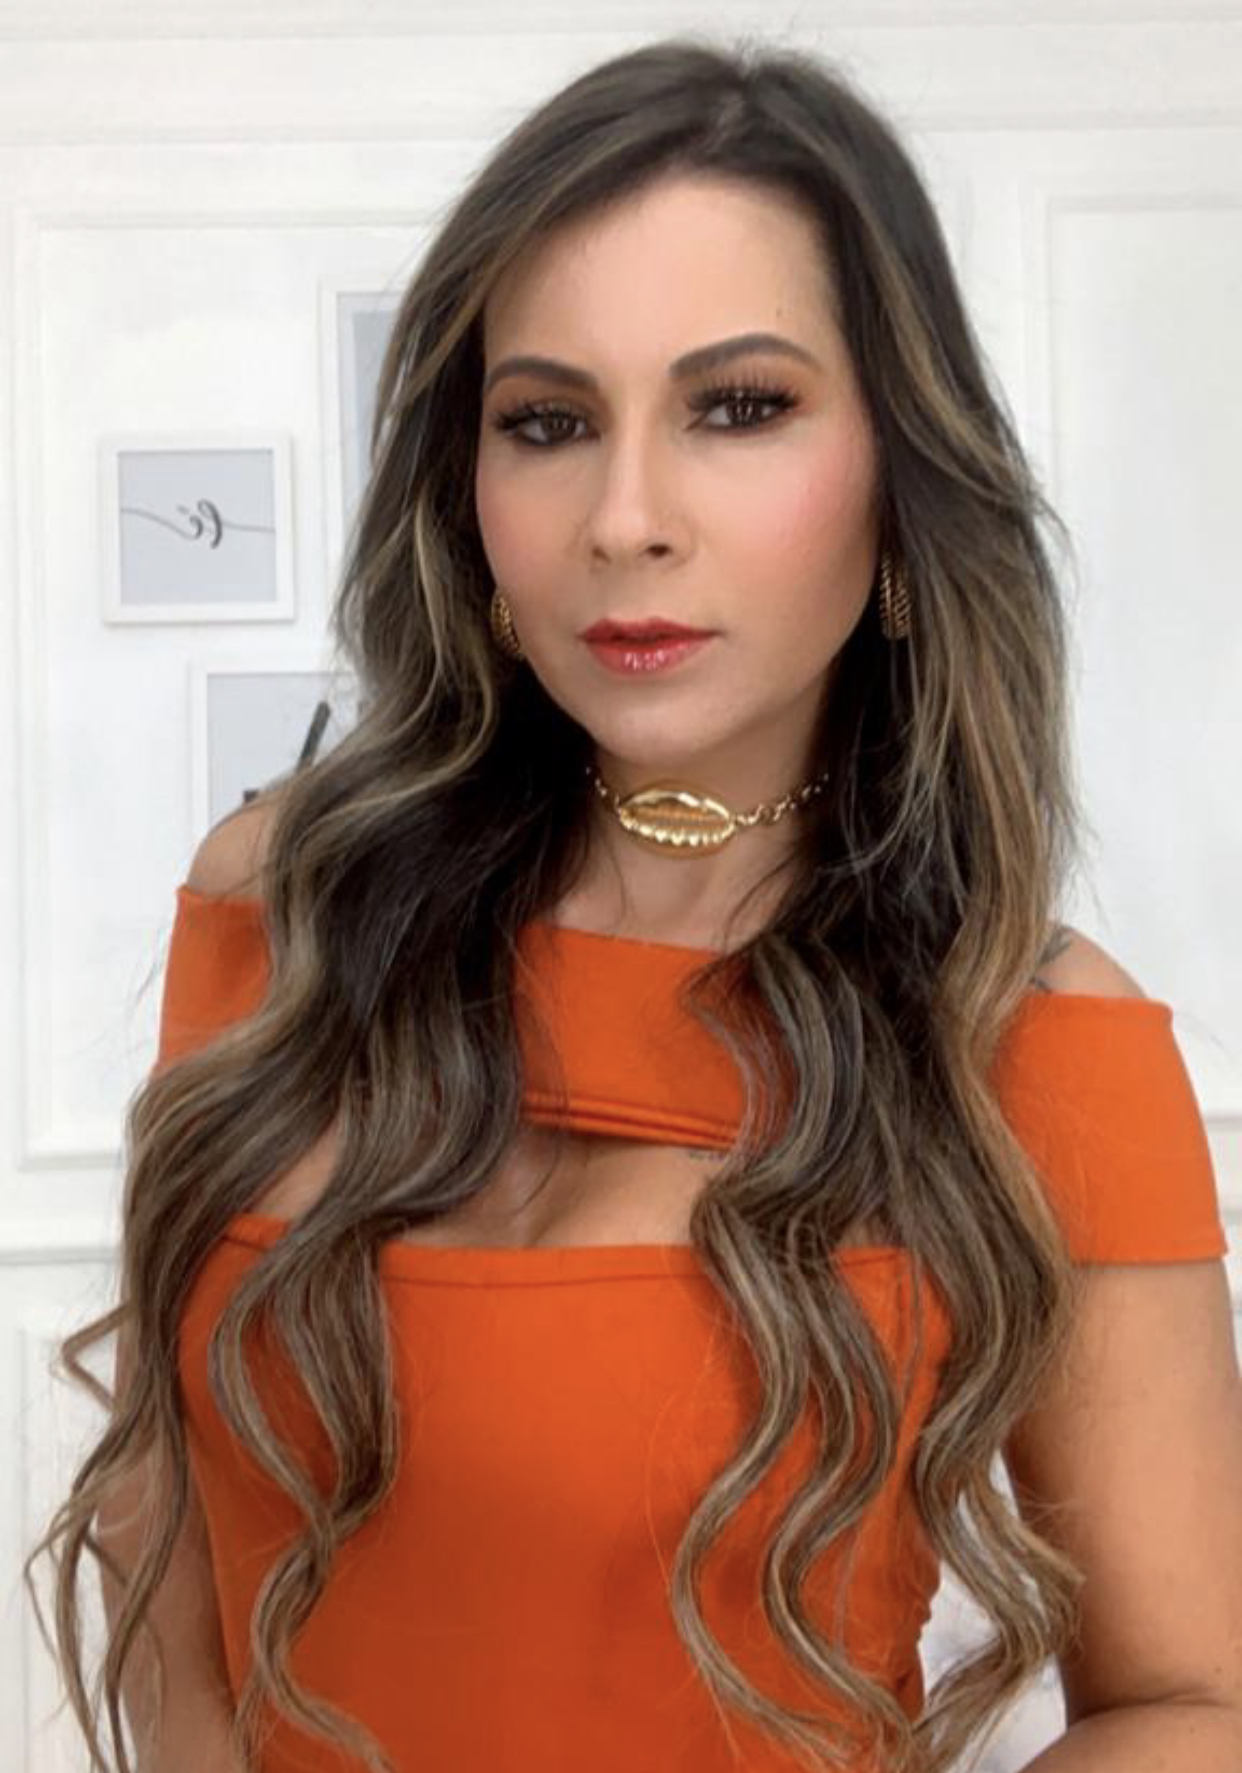 Fernanda Maciel